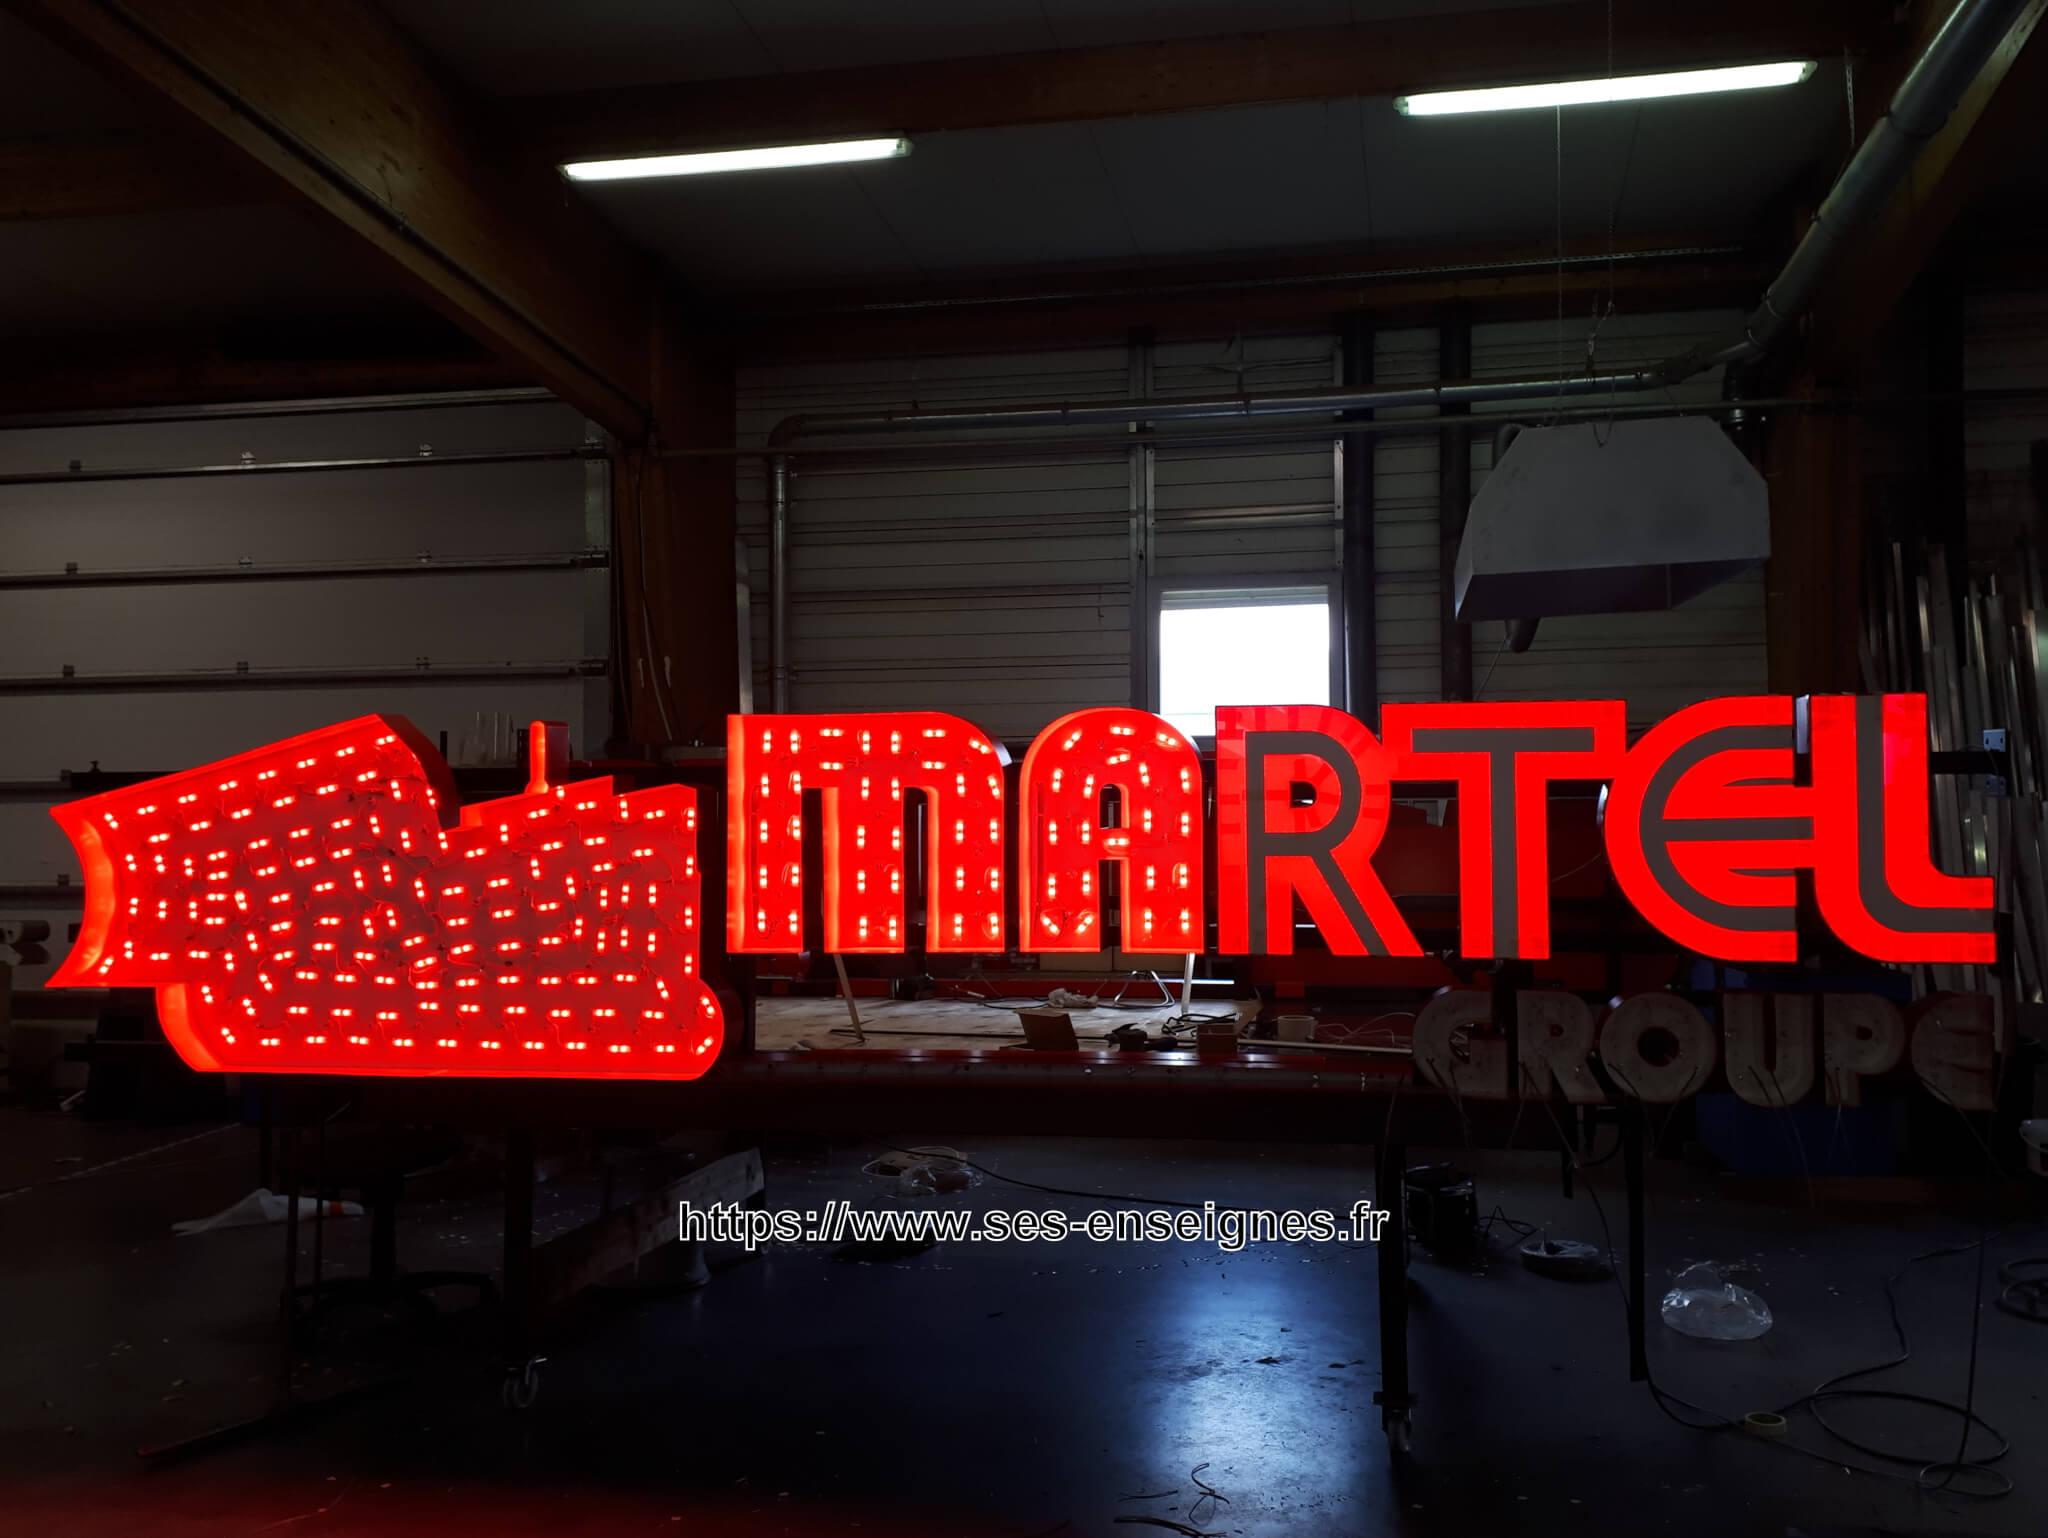 Enseigne grand format lumineuse à Lyon -Fabrication et installation de led - SES Grigny - Rhône